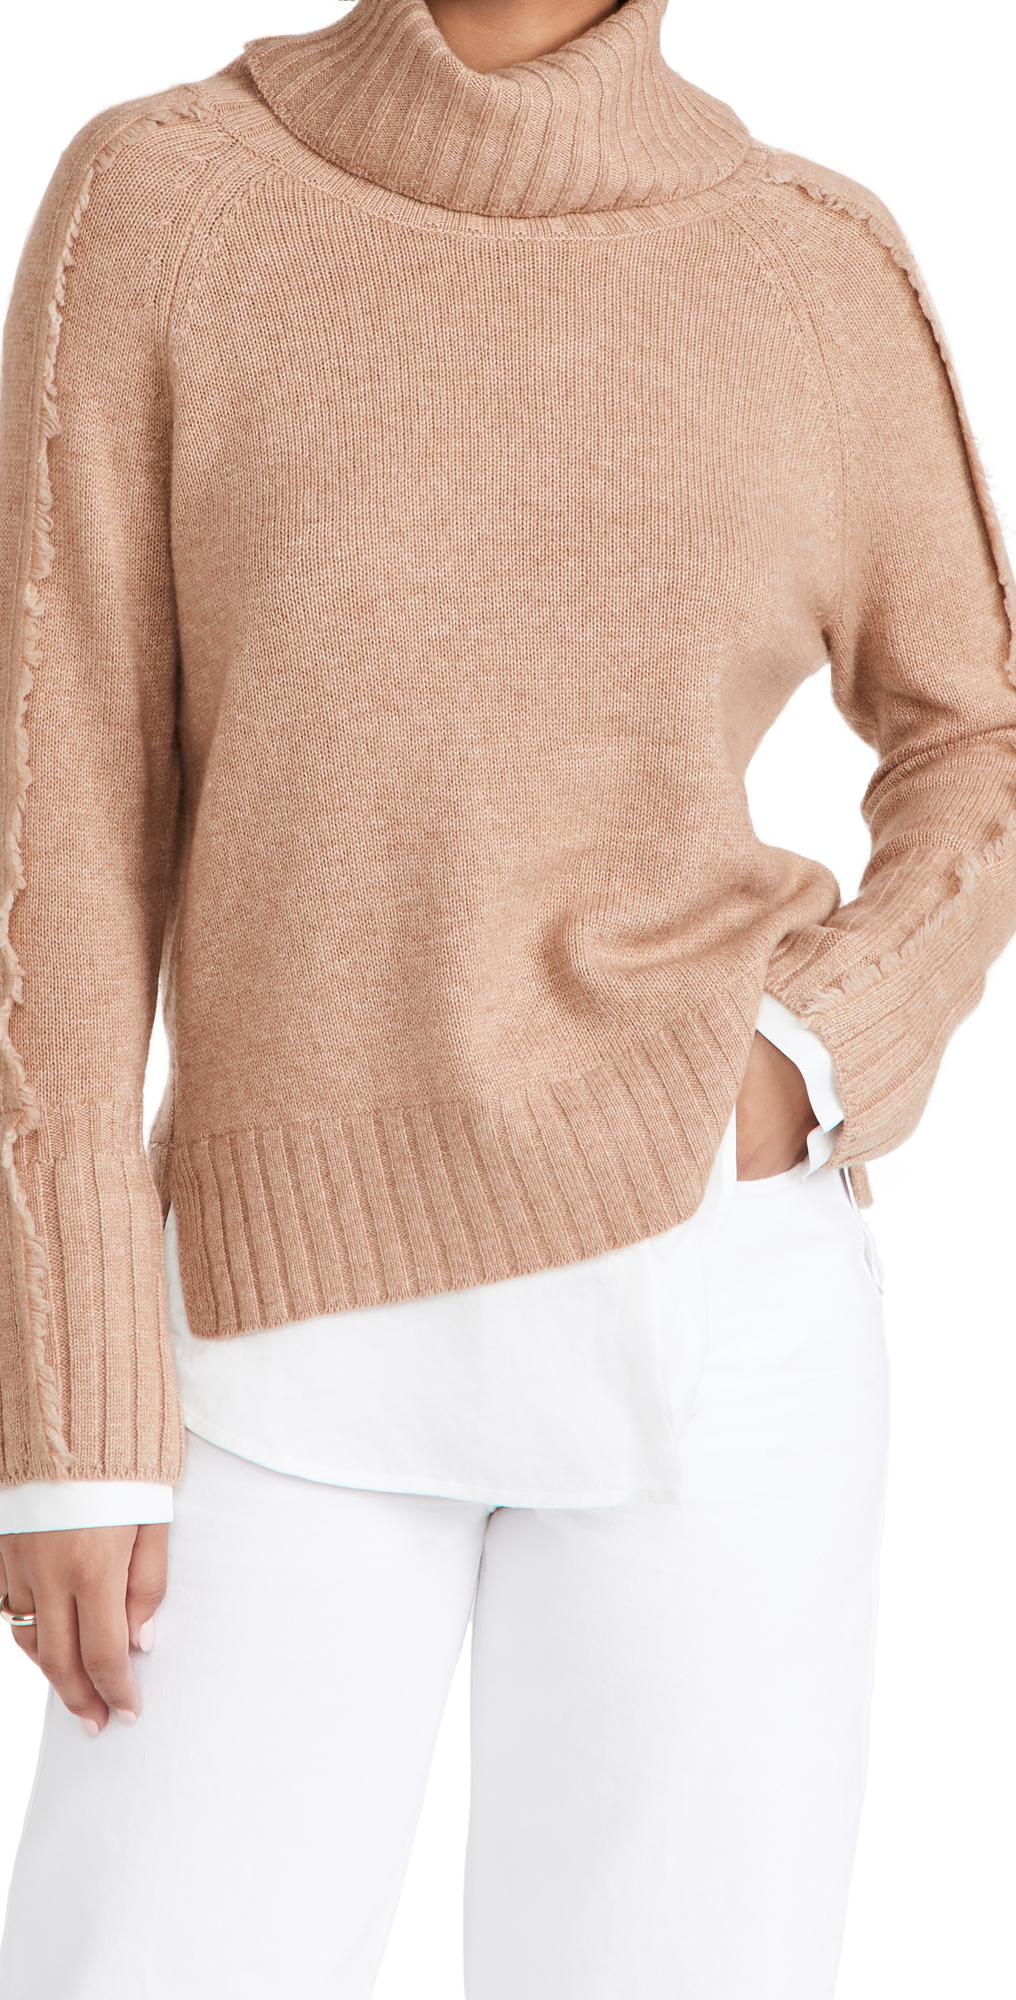 Jolie Fringe Layered Sweater